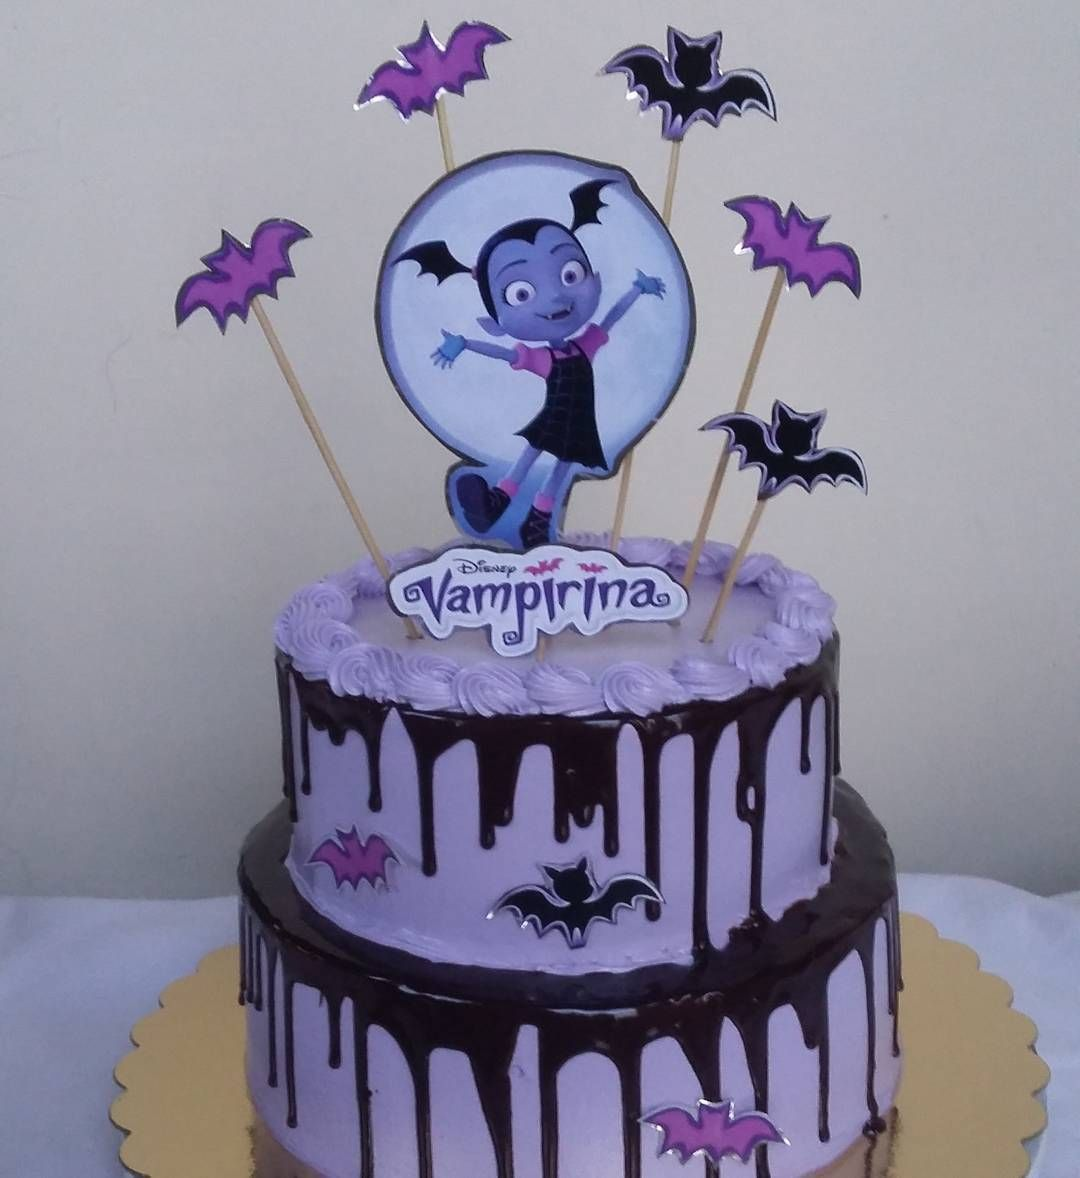 vampirina birthday Image result for vampirina birthday cake |